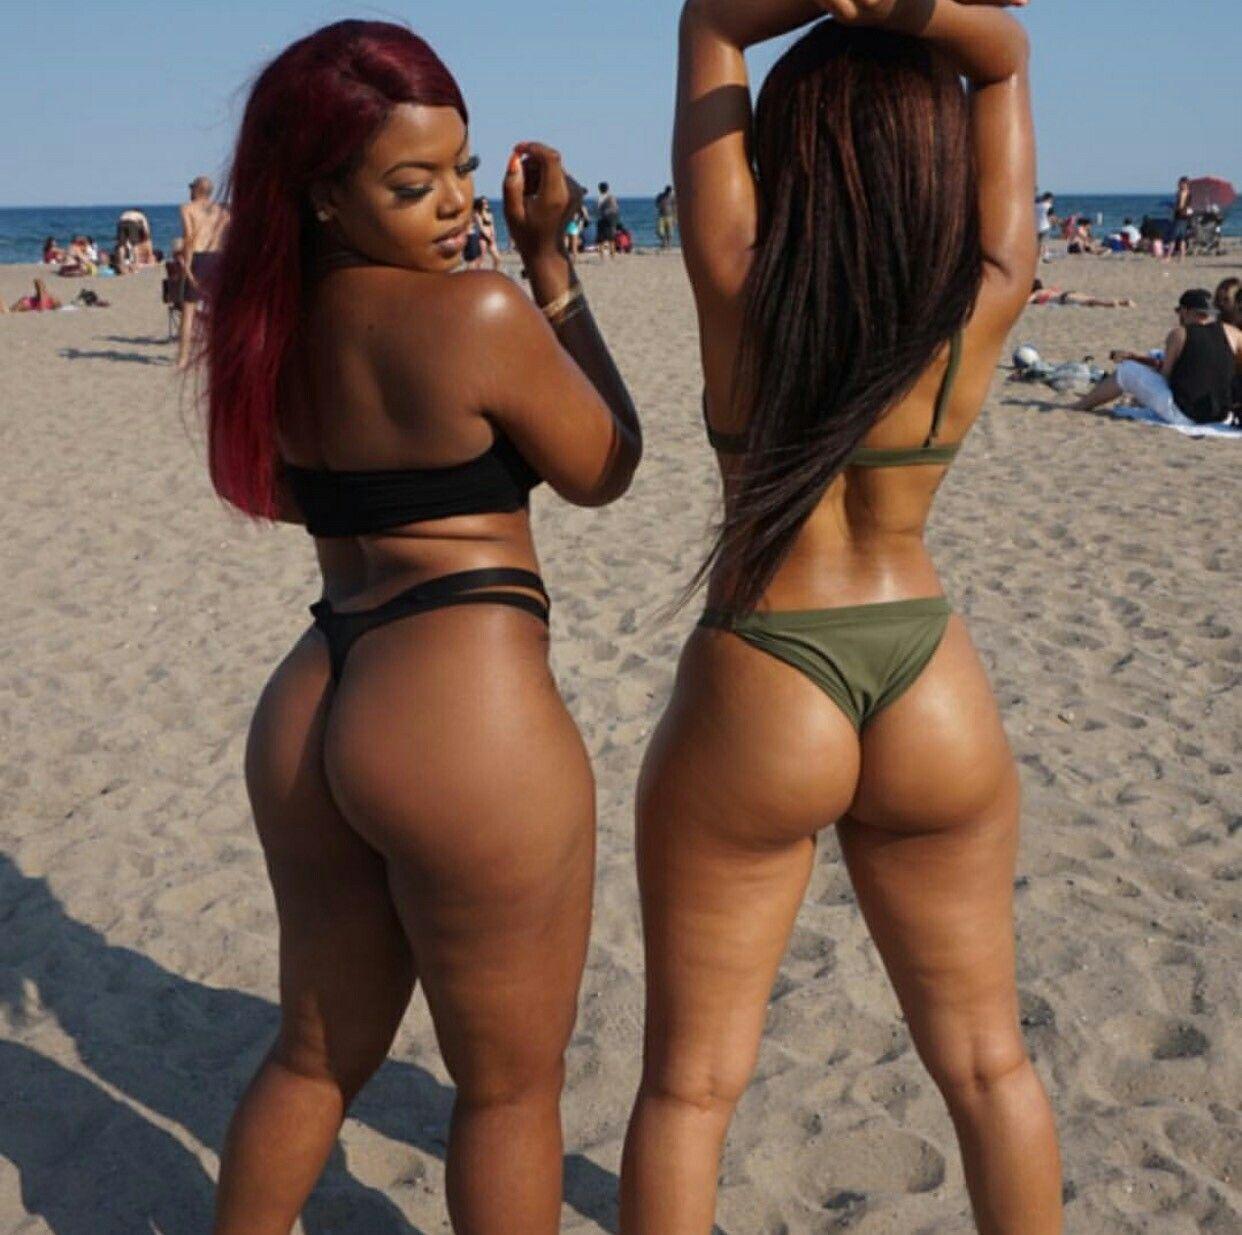 pings56 on black women   pinterest   black women, woman and black